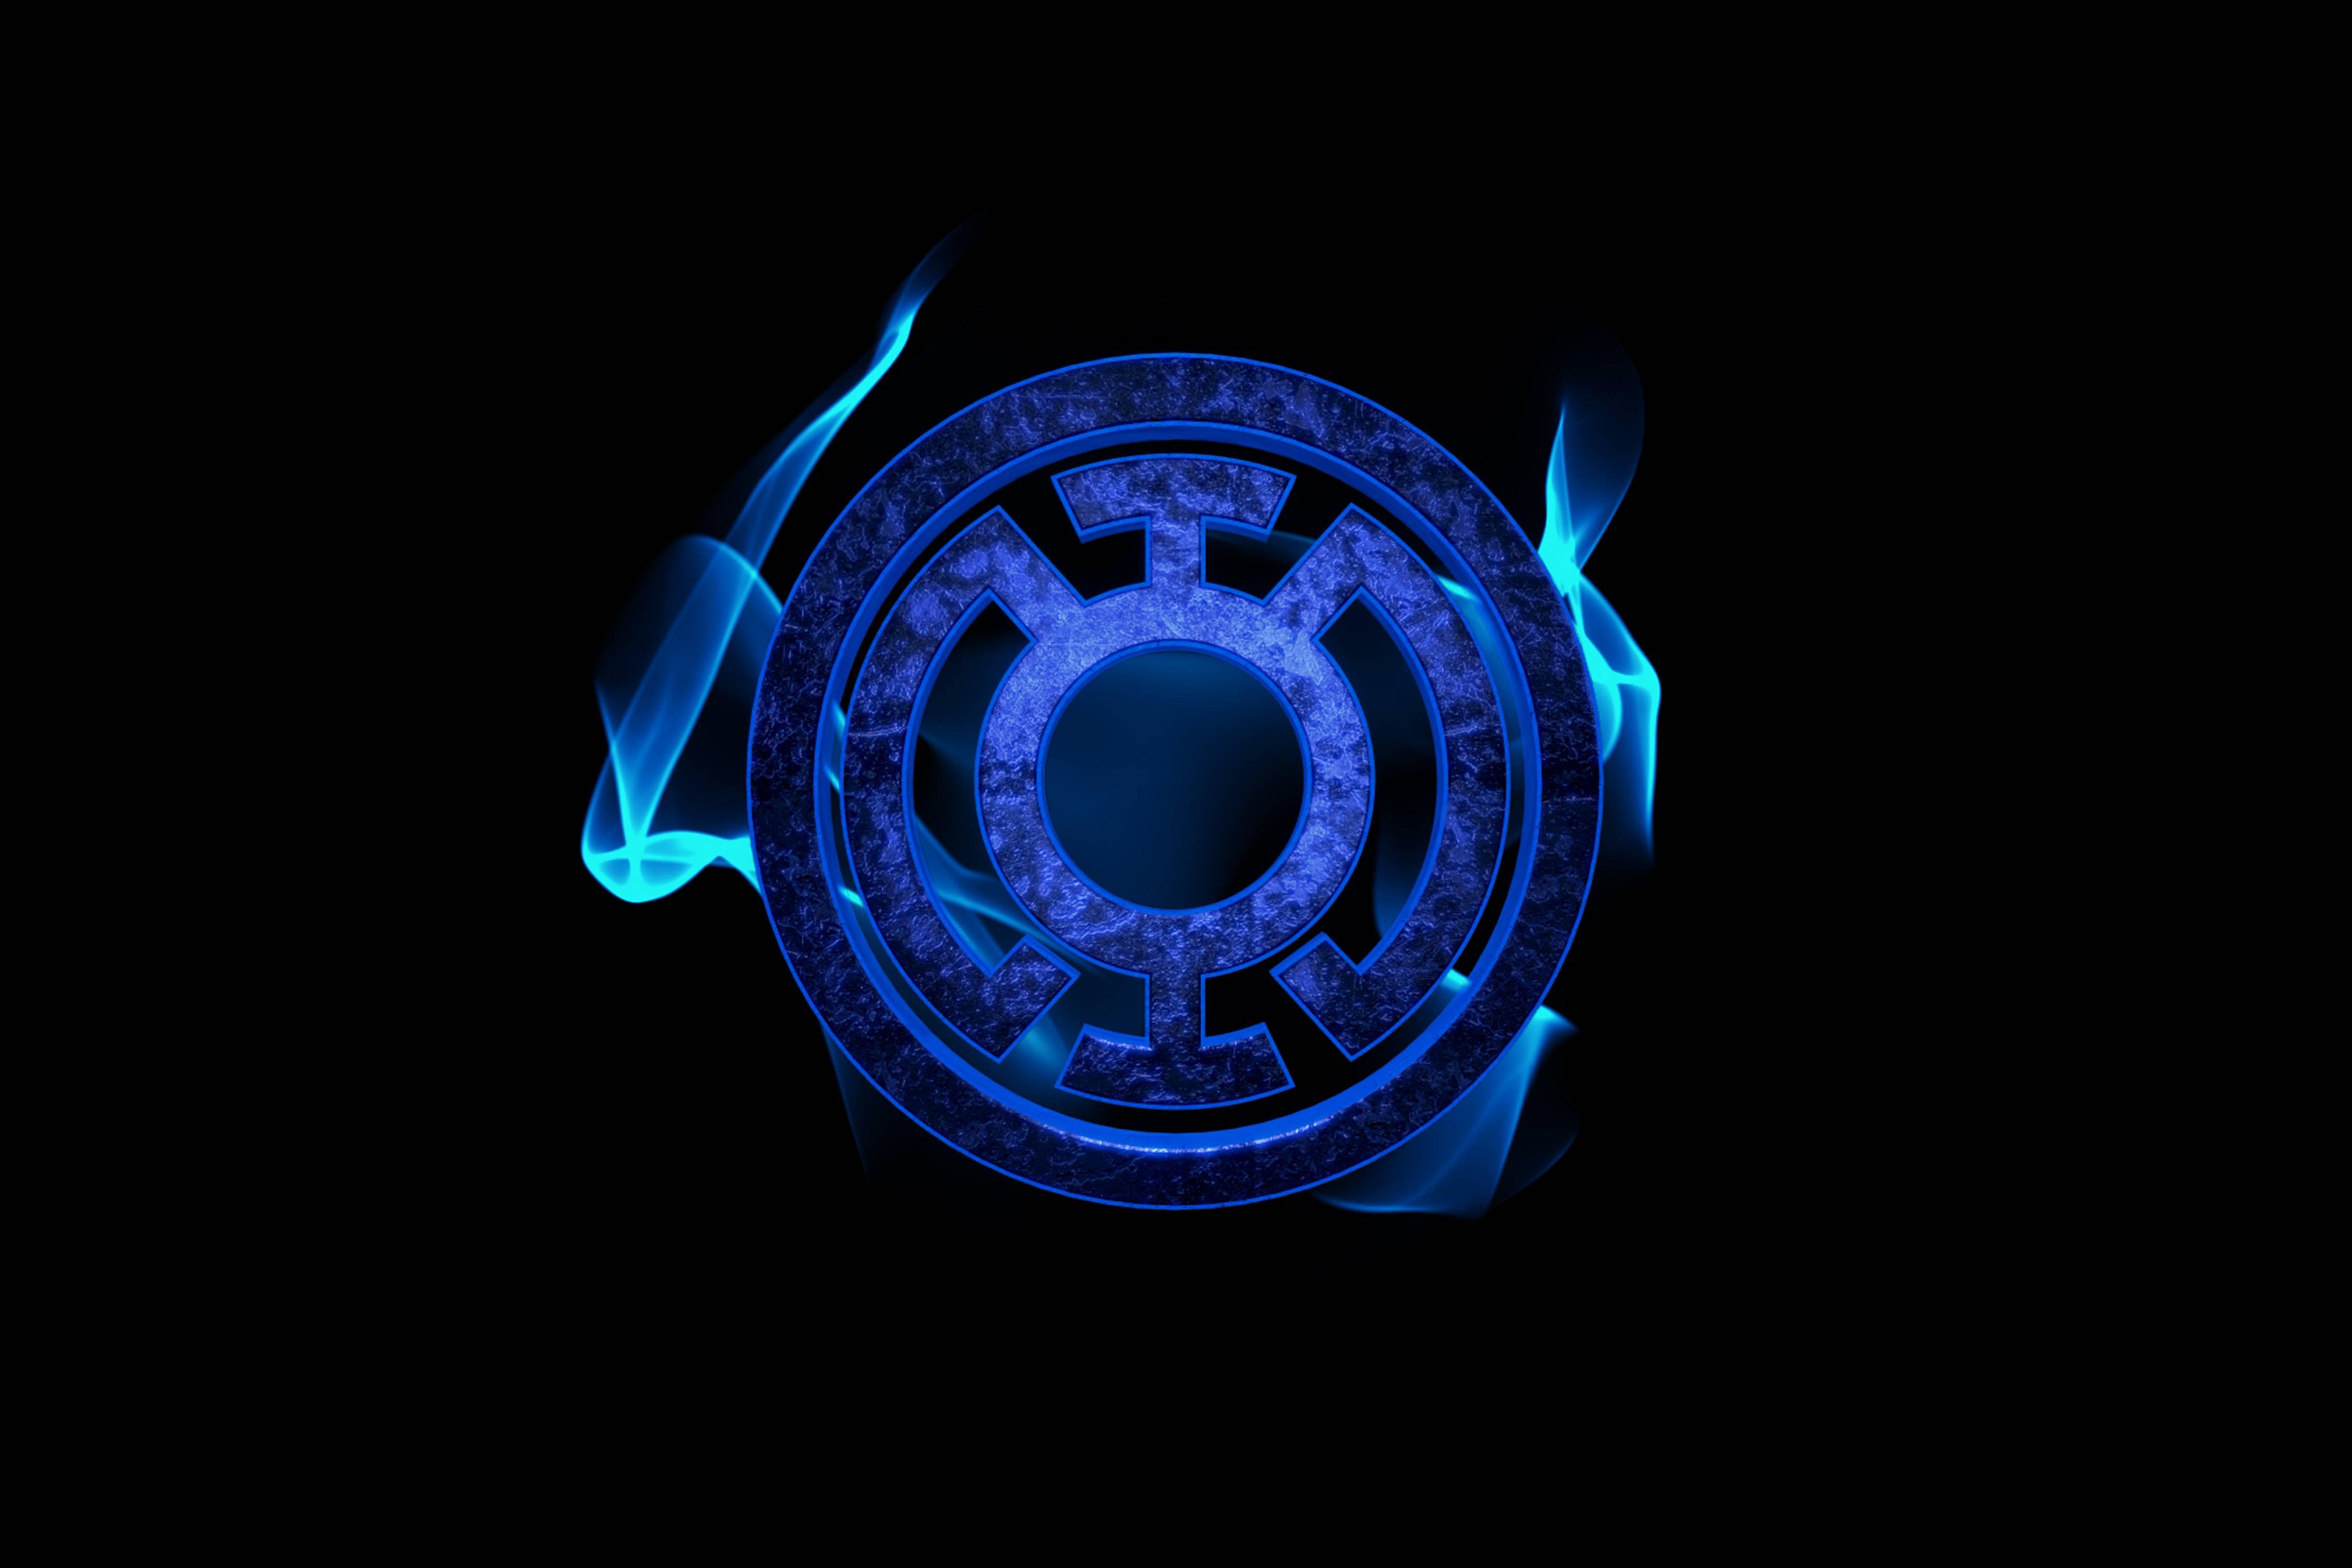 Blue Lantern Wallpapers 4500x3000